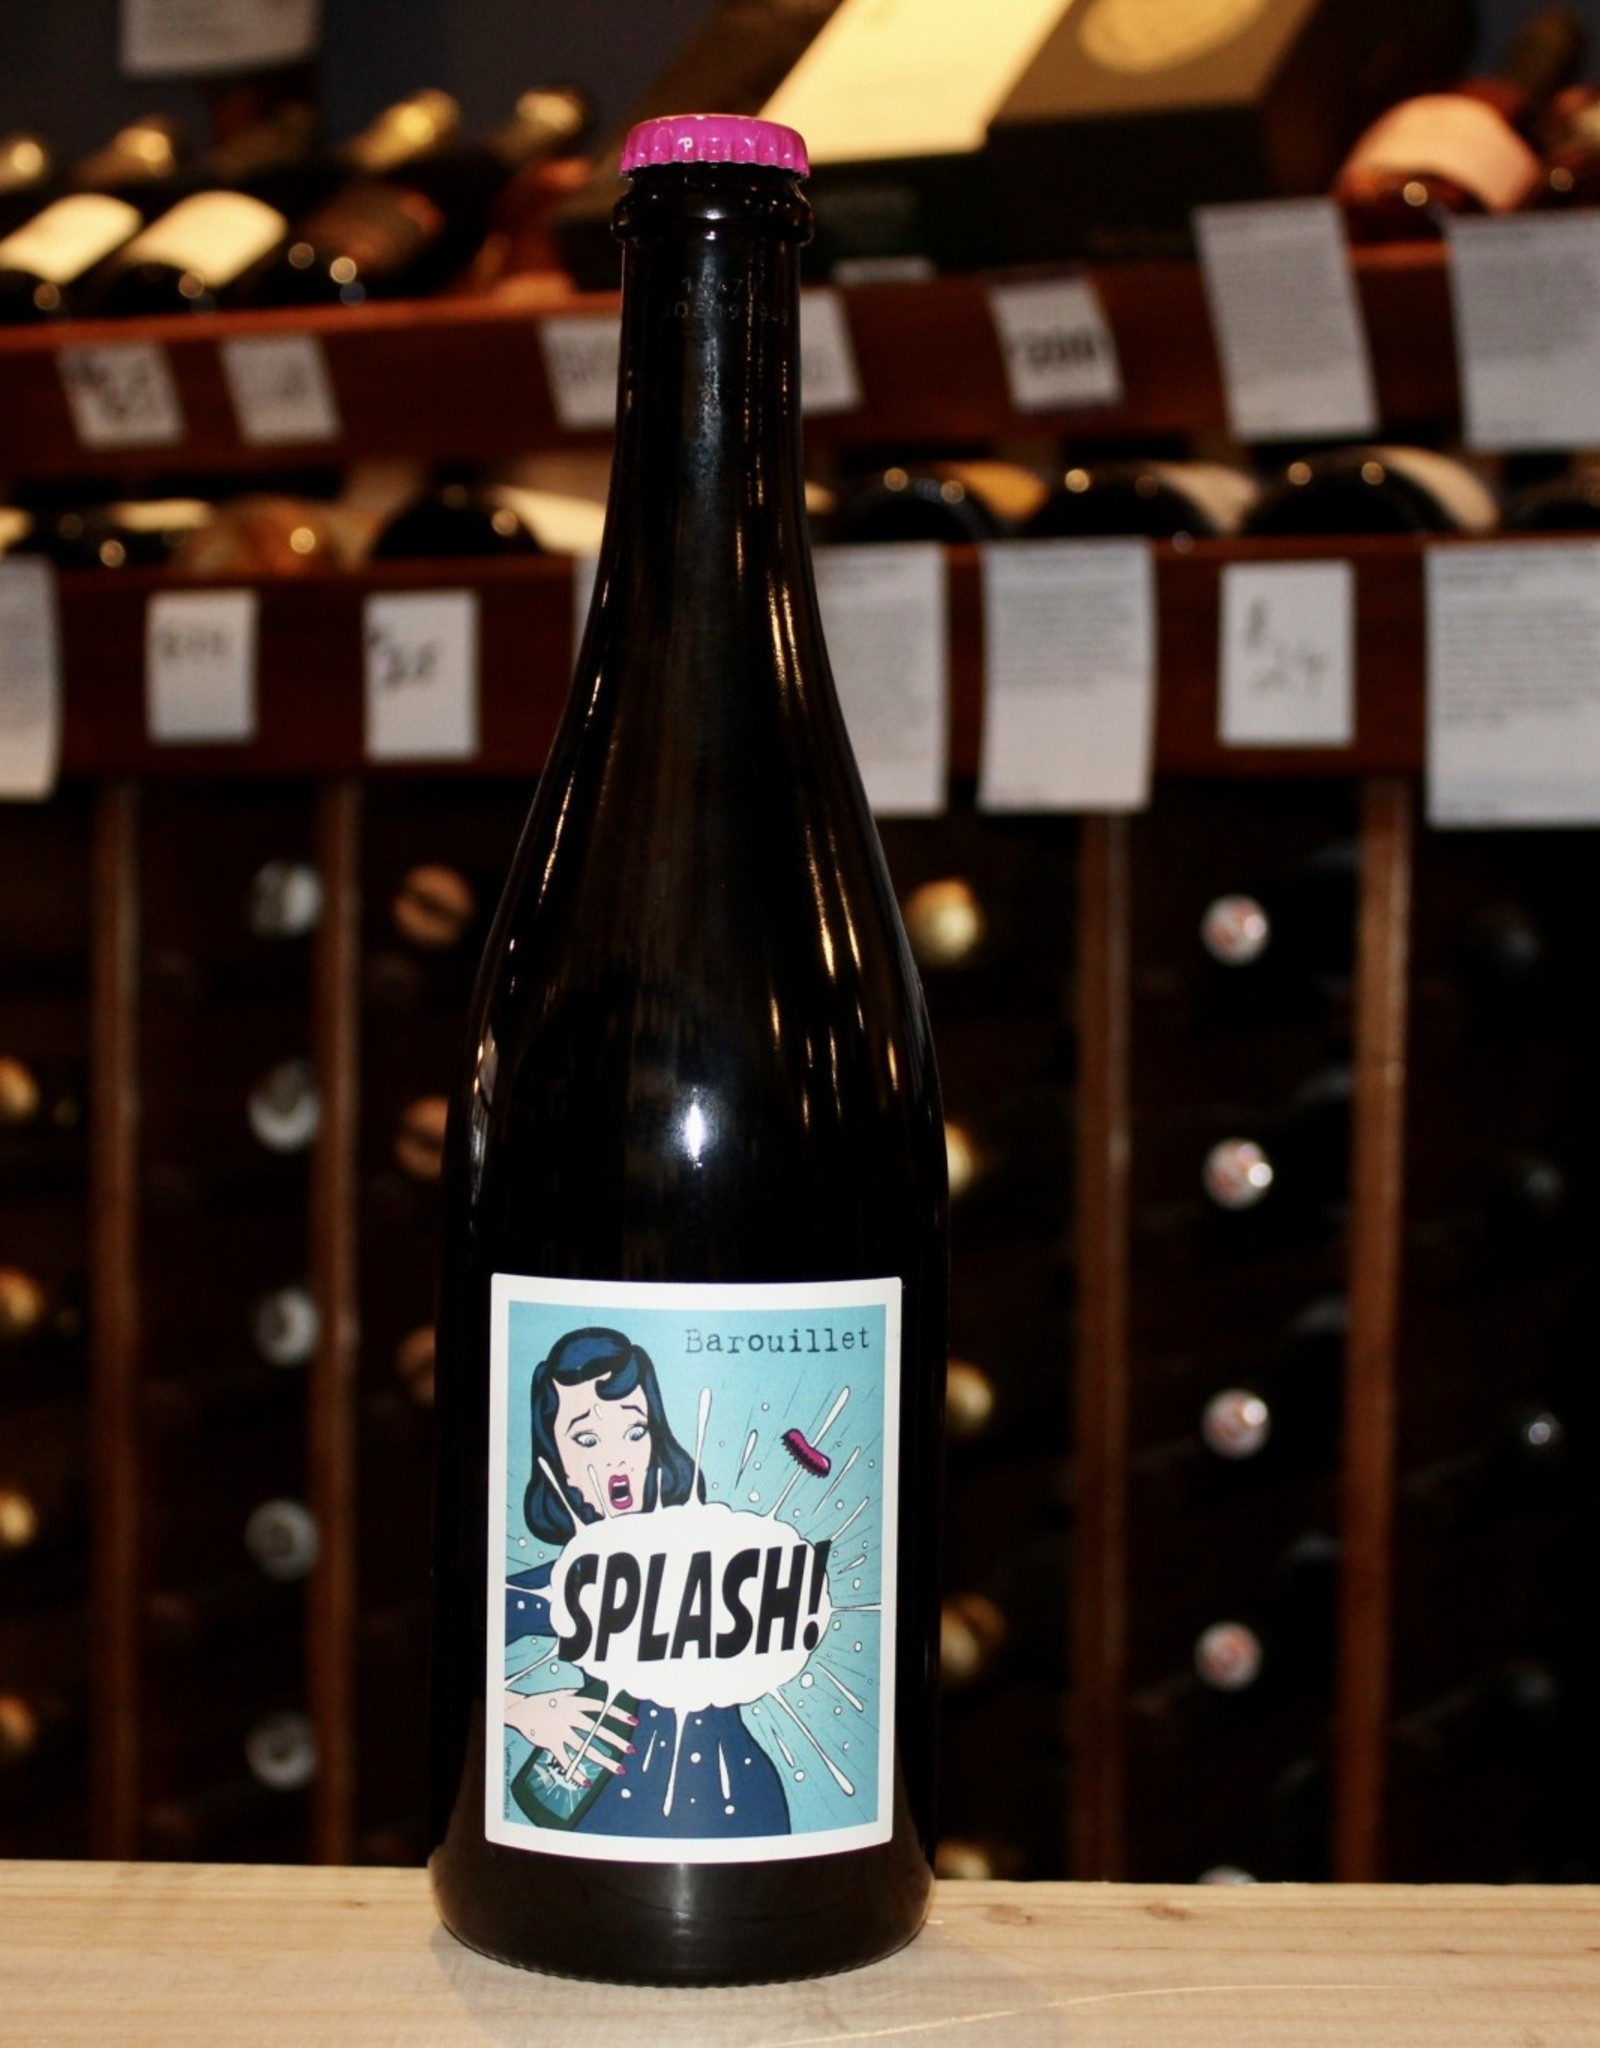 Wine 2019 Barouillet Splash Semillon Pet Nat - Southwest, France (750ml)